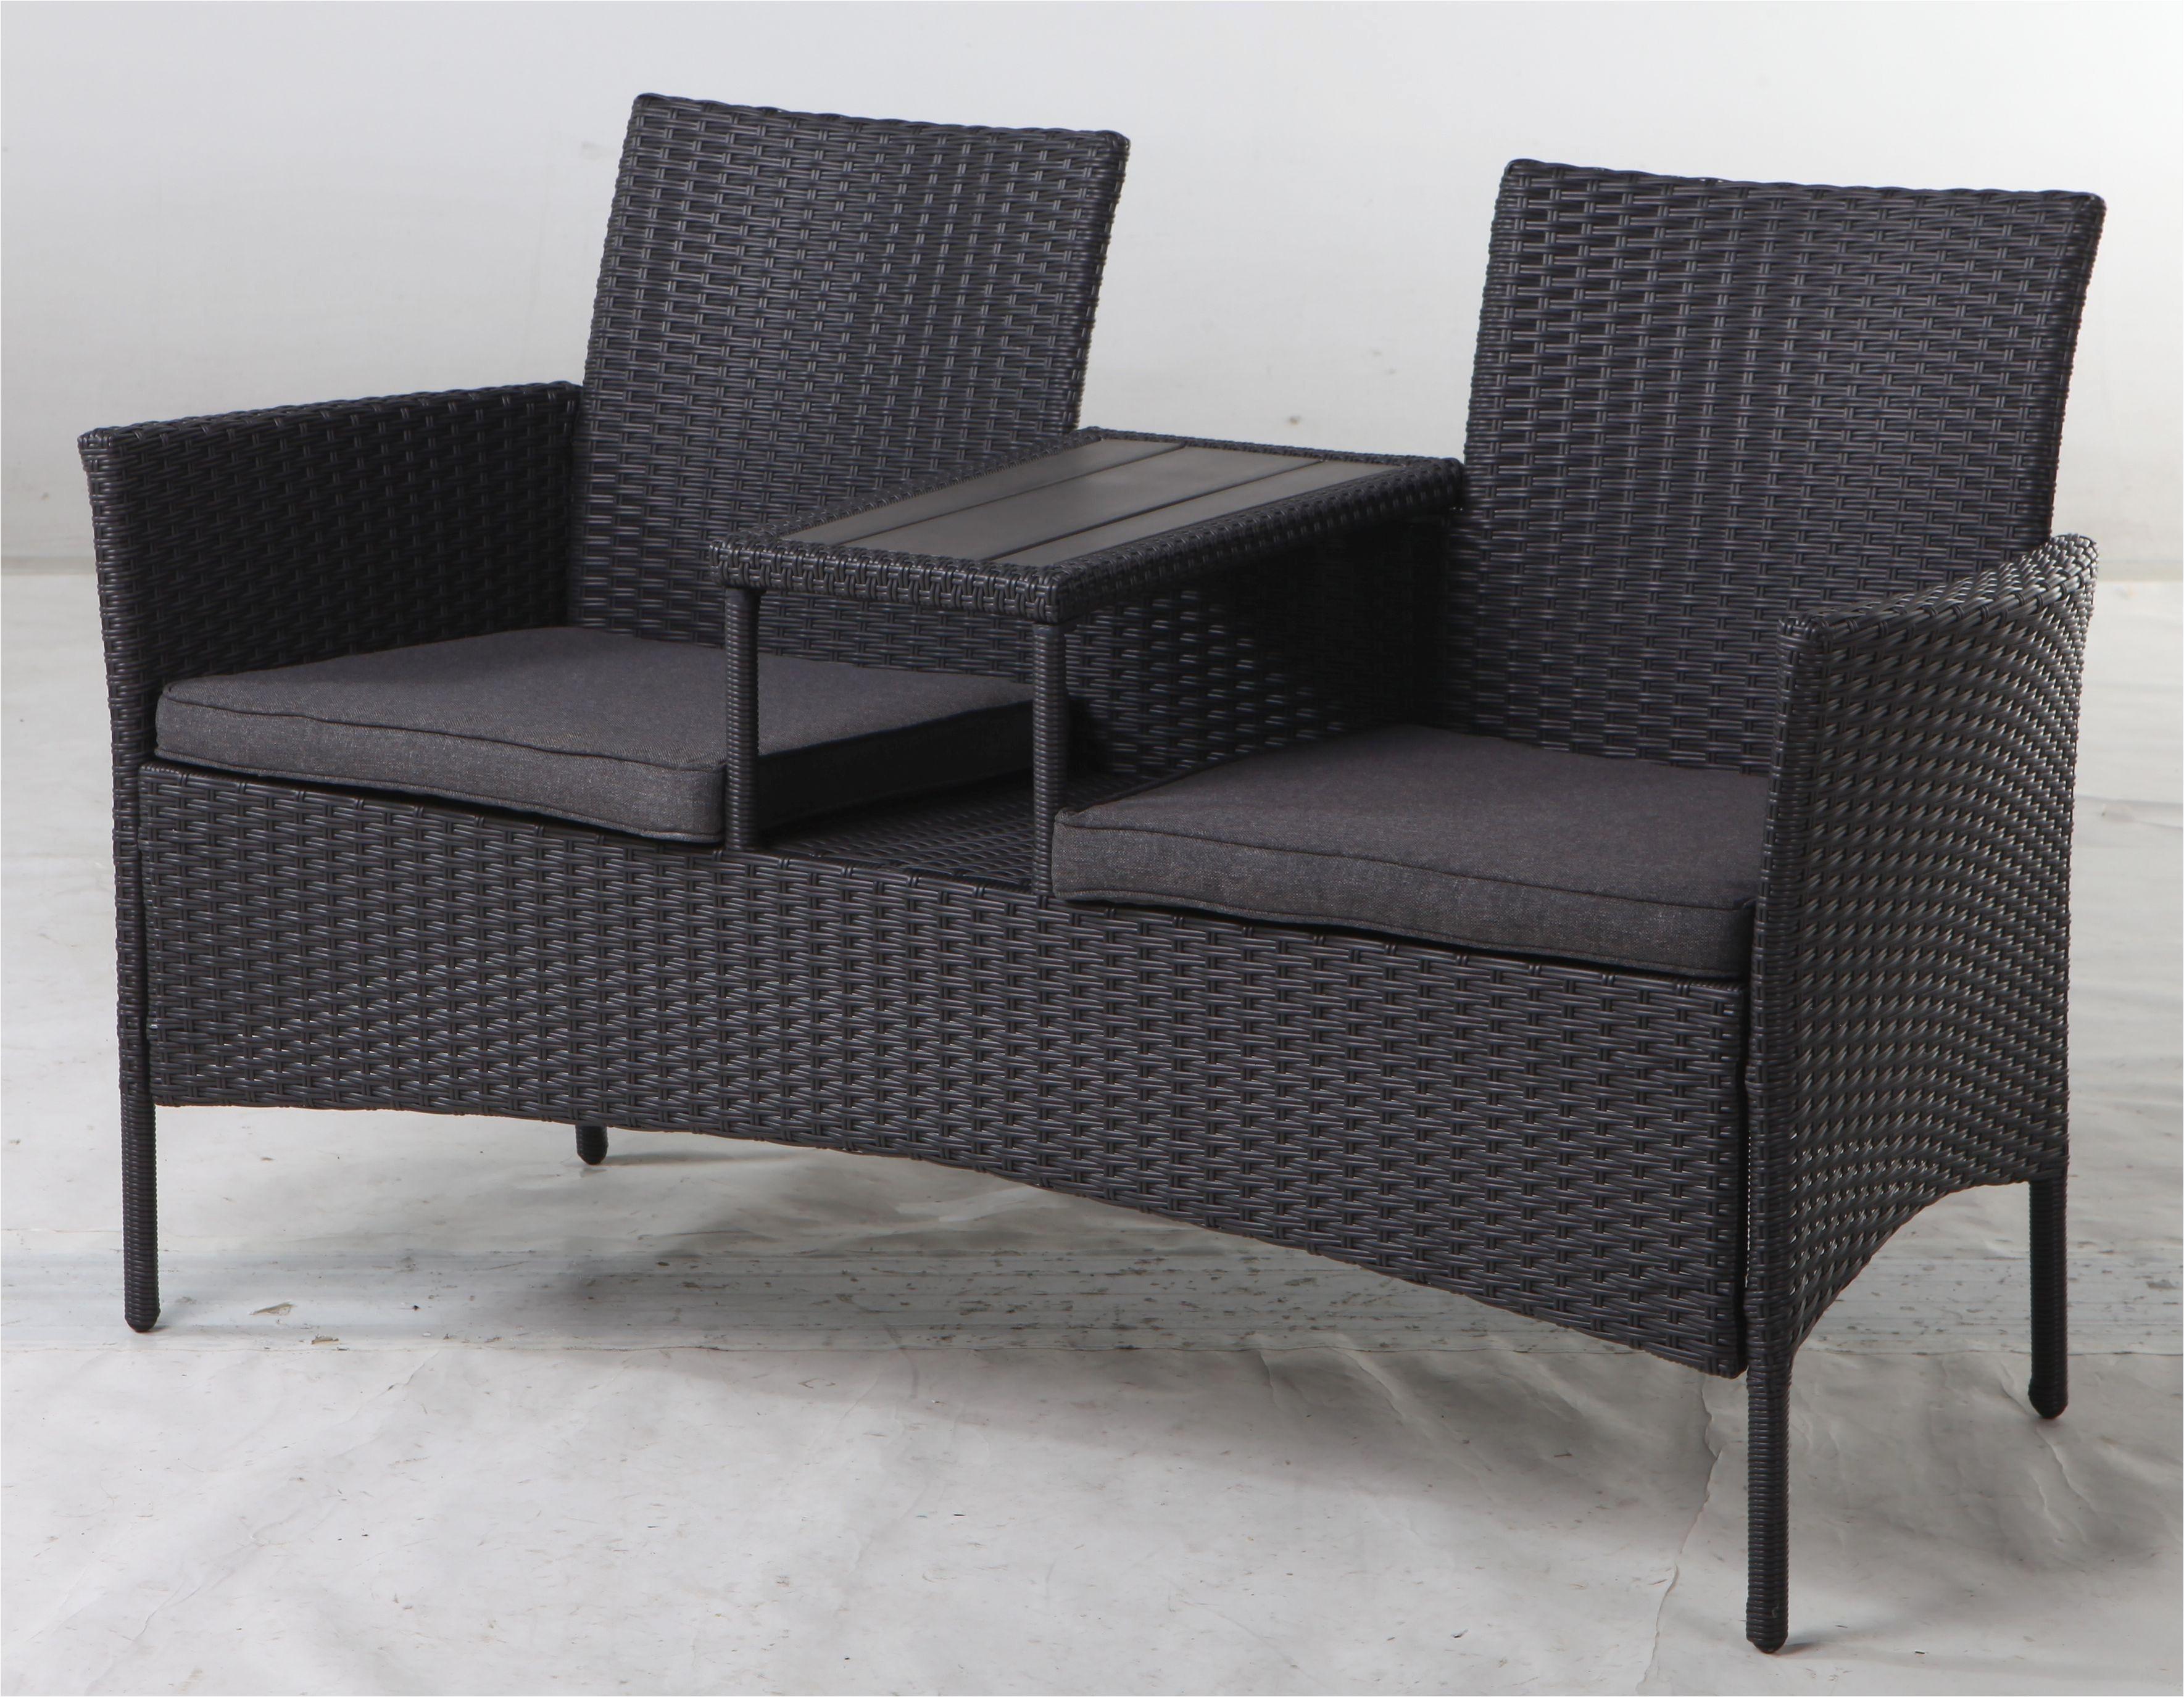 full size of home design pondarosa furniture lovely furniture ponderosa furniture ponderosa furniture 0d